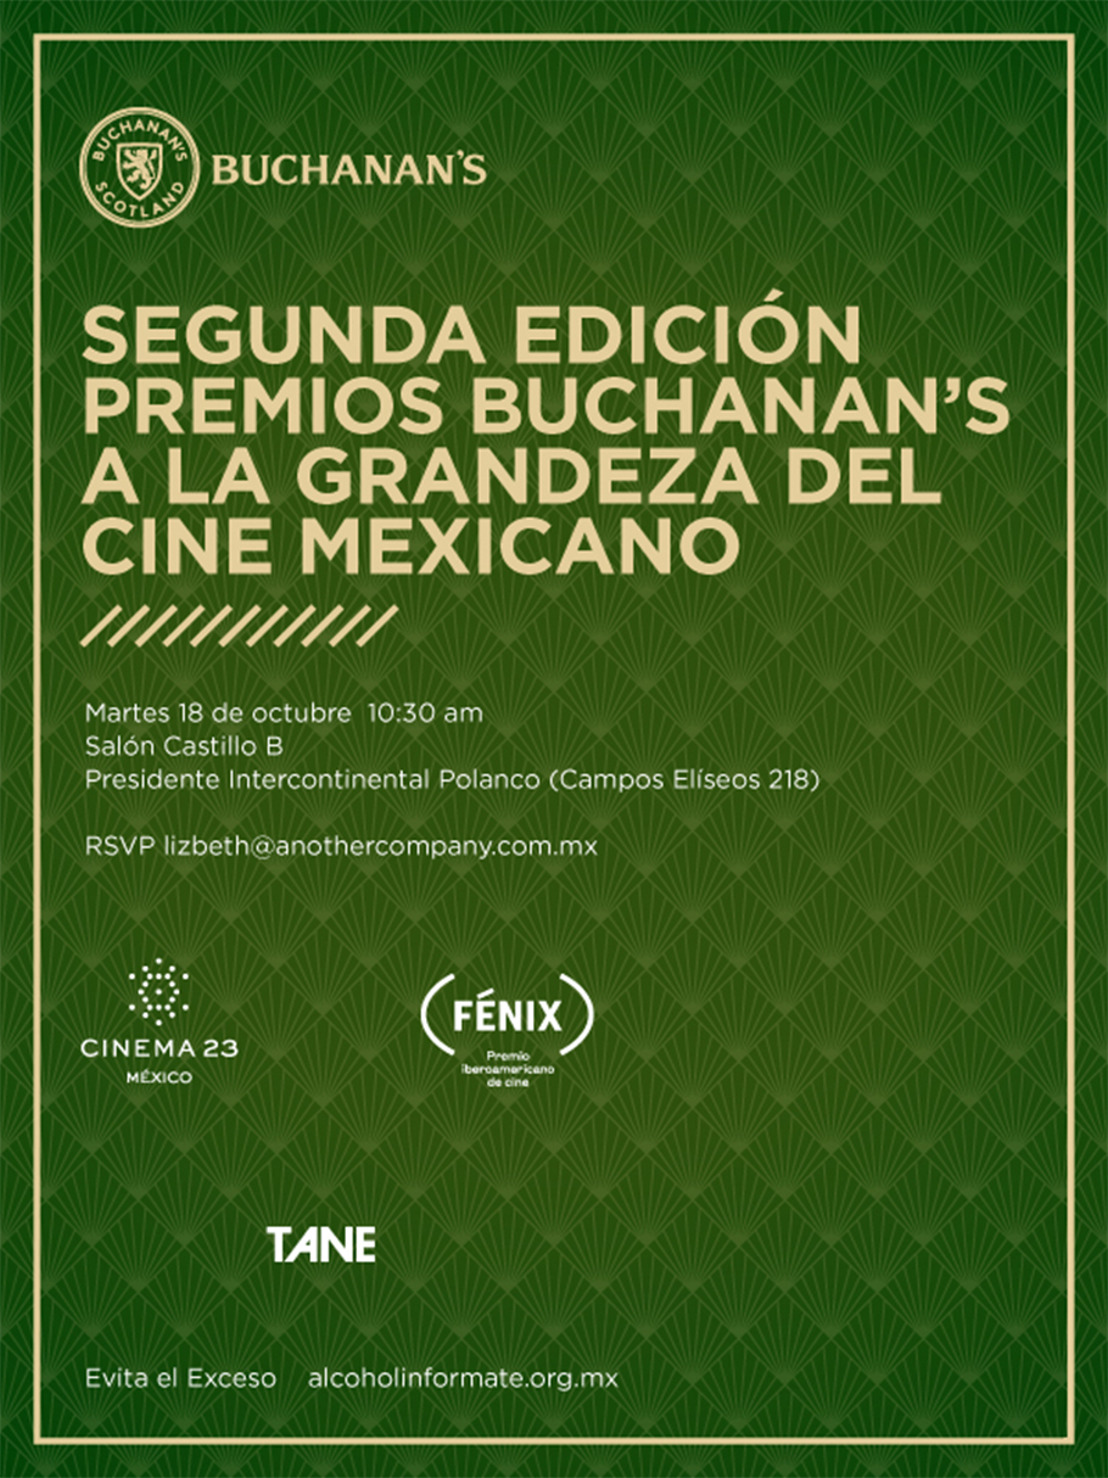 Rueda de Prensa  |  Premio Buchanan's al Cine Mexicano